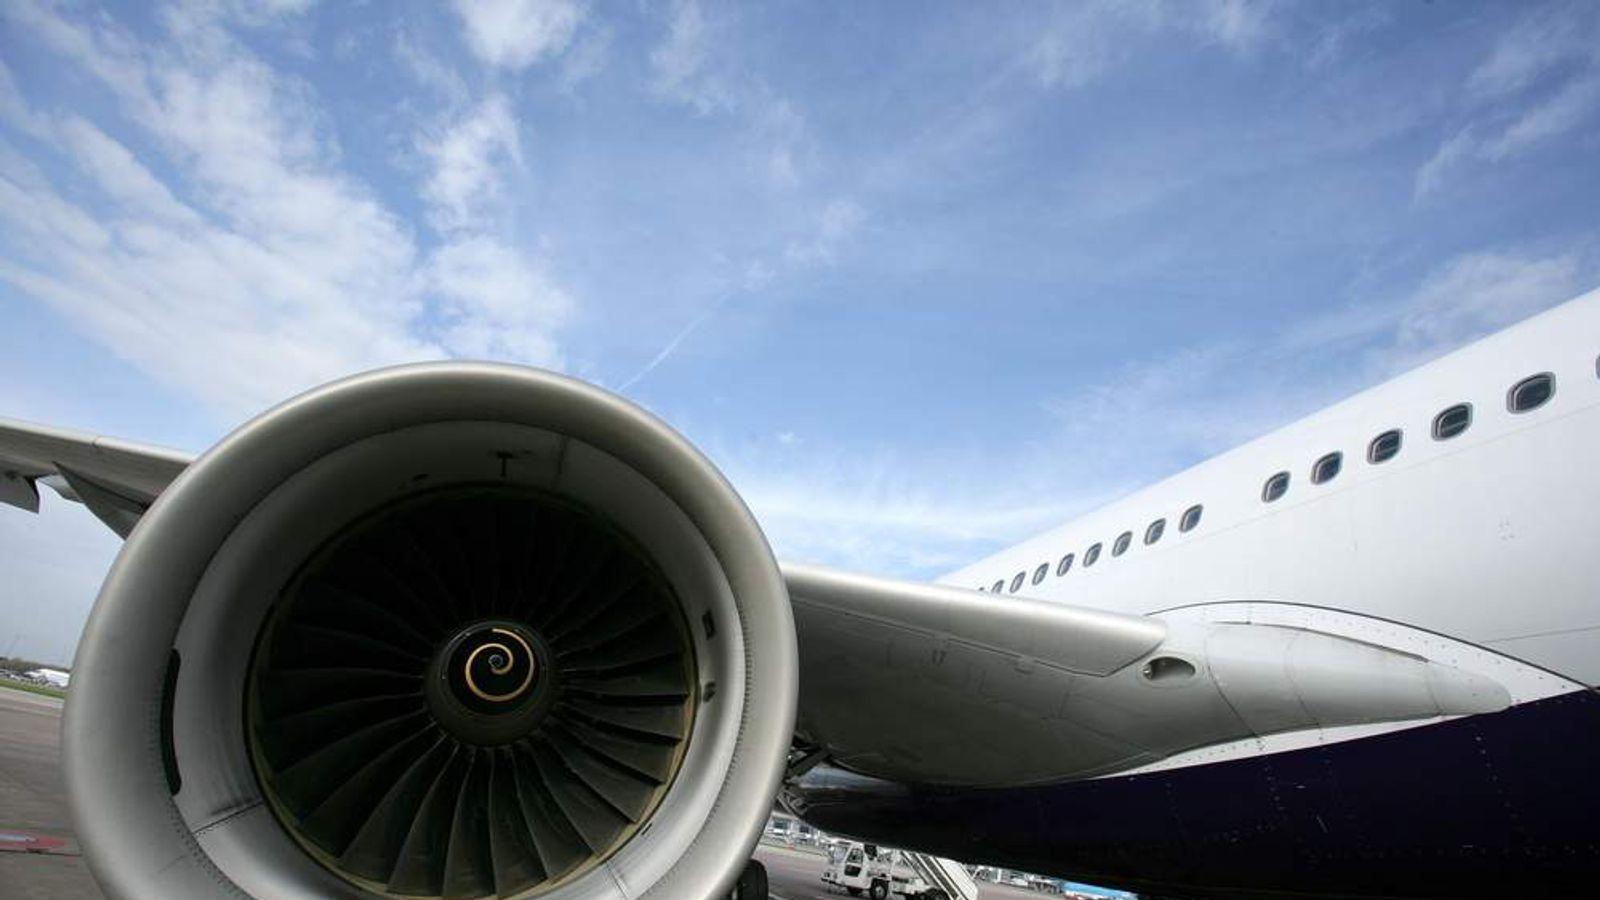 Rolls-Royce aircraft engine